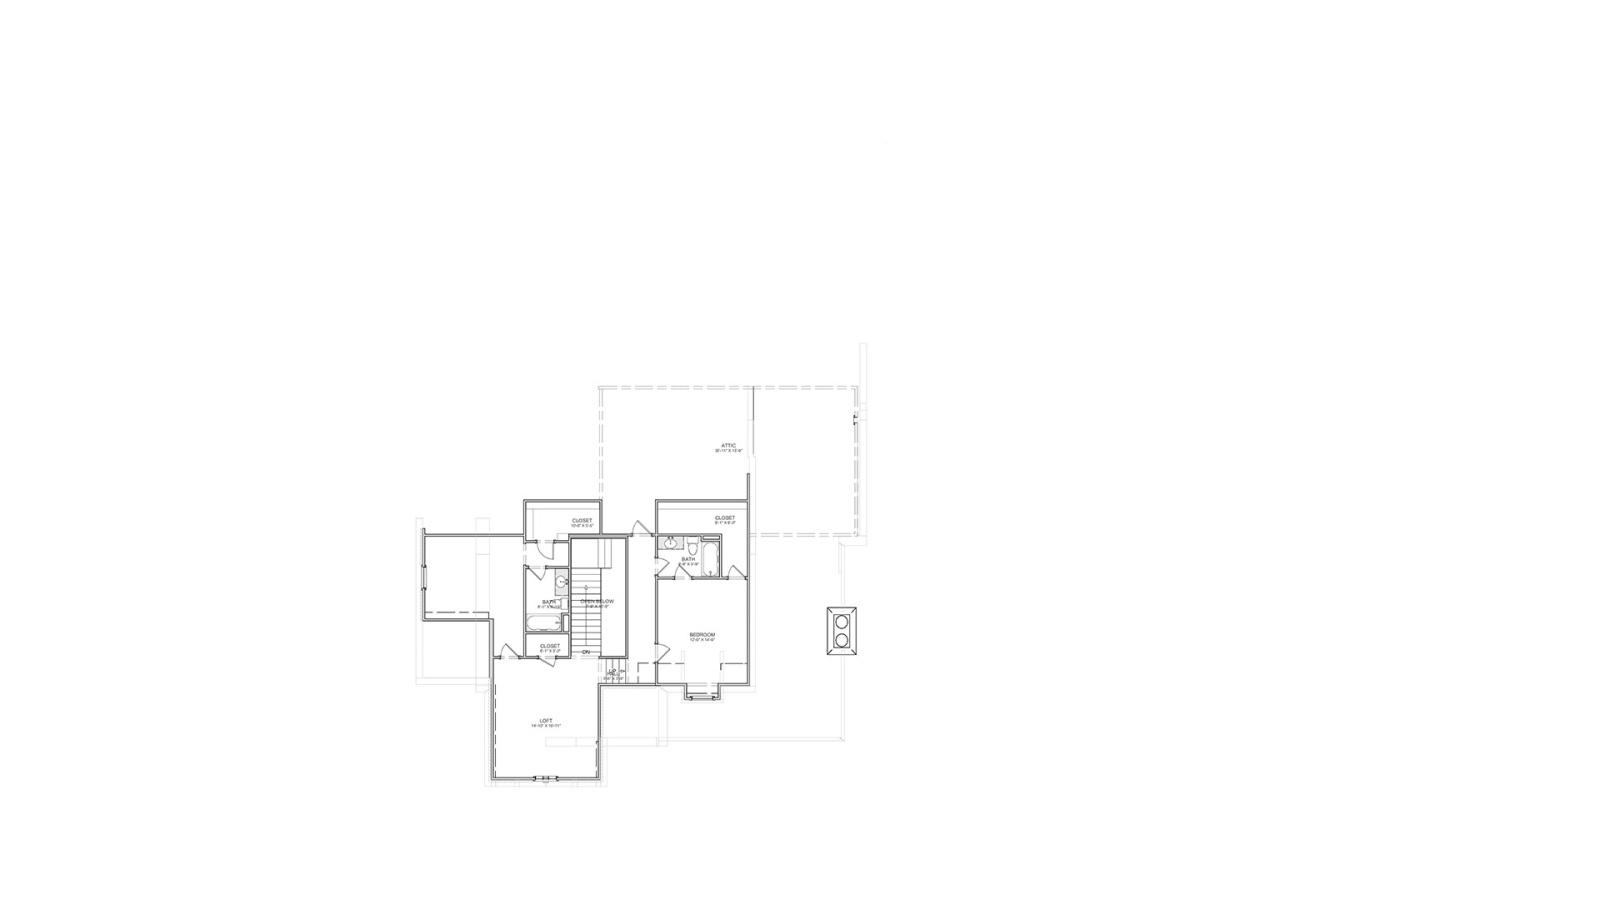 5 Bedrooms Bedrooms, ,4 BathroomsBathrooms,Custom Home,Home Plans,1009